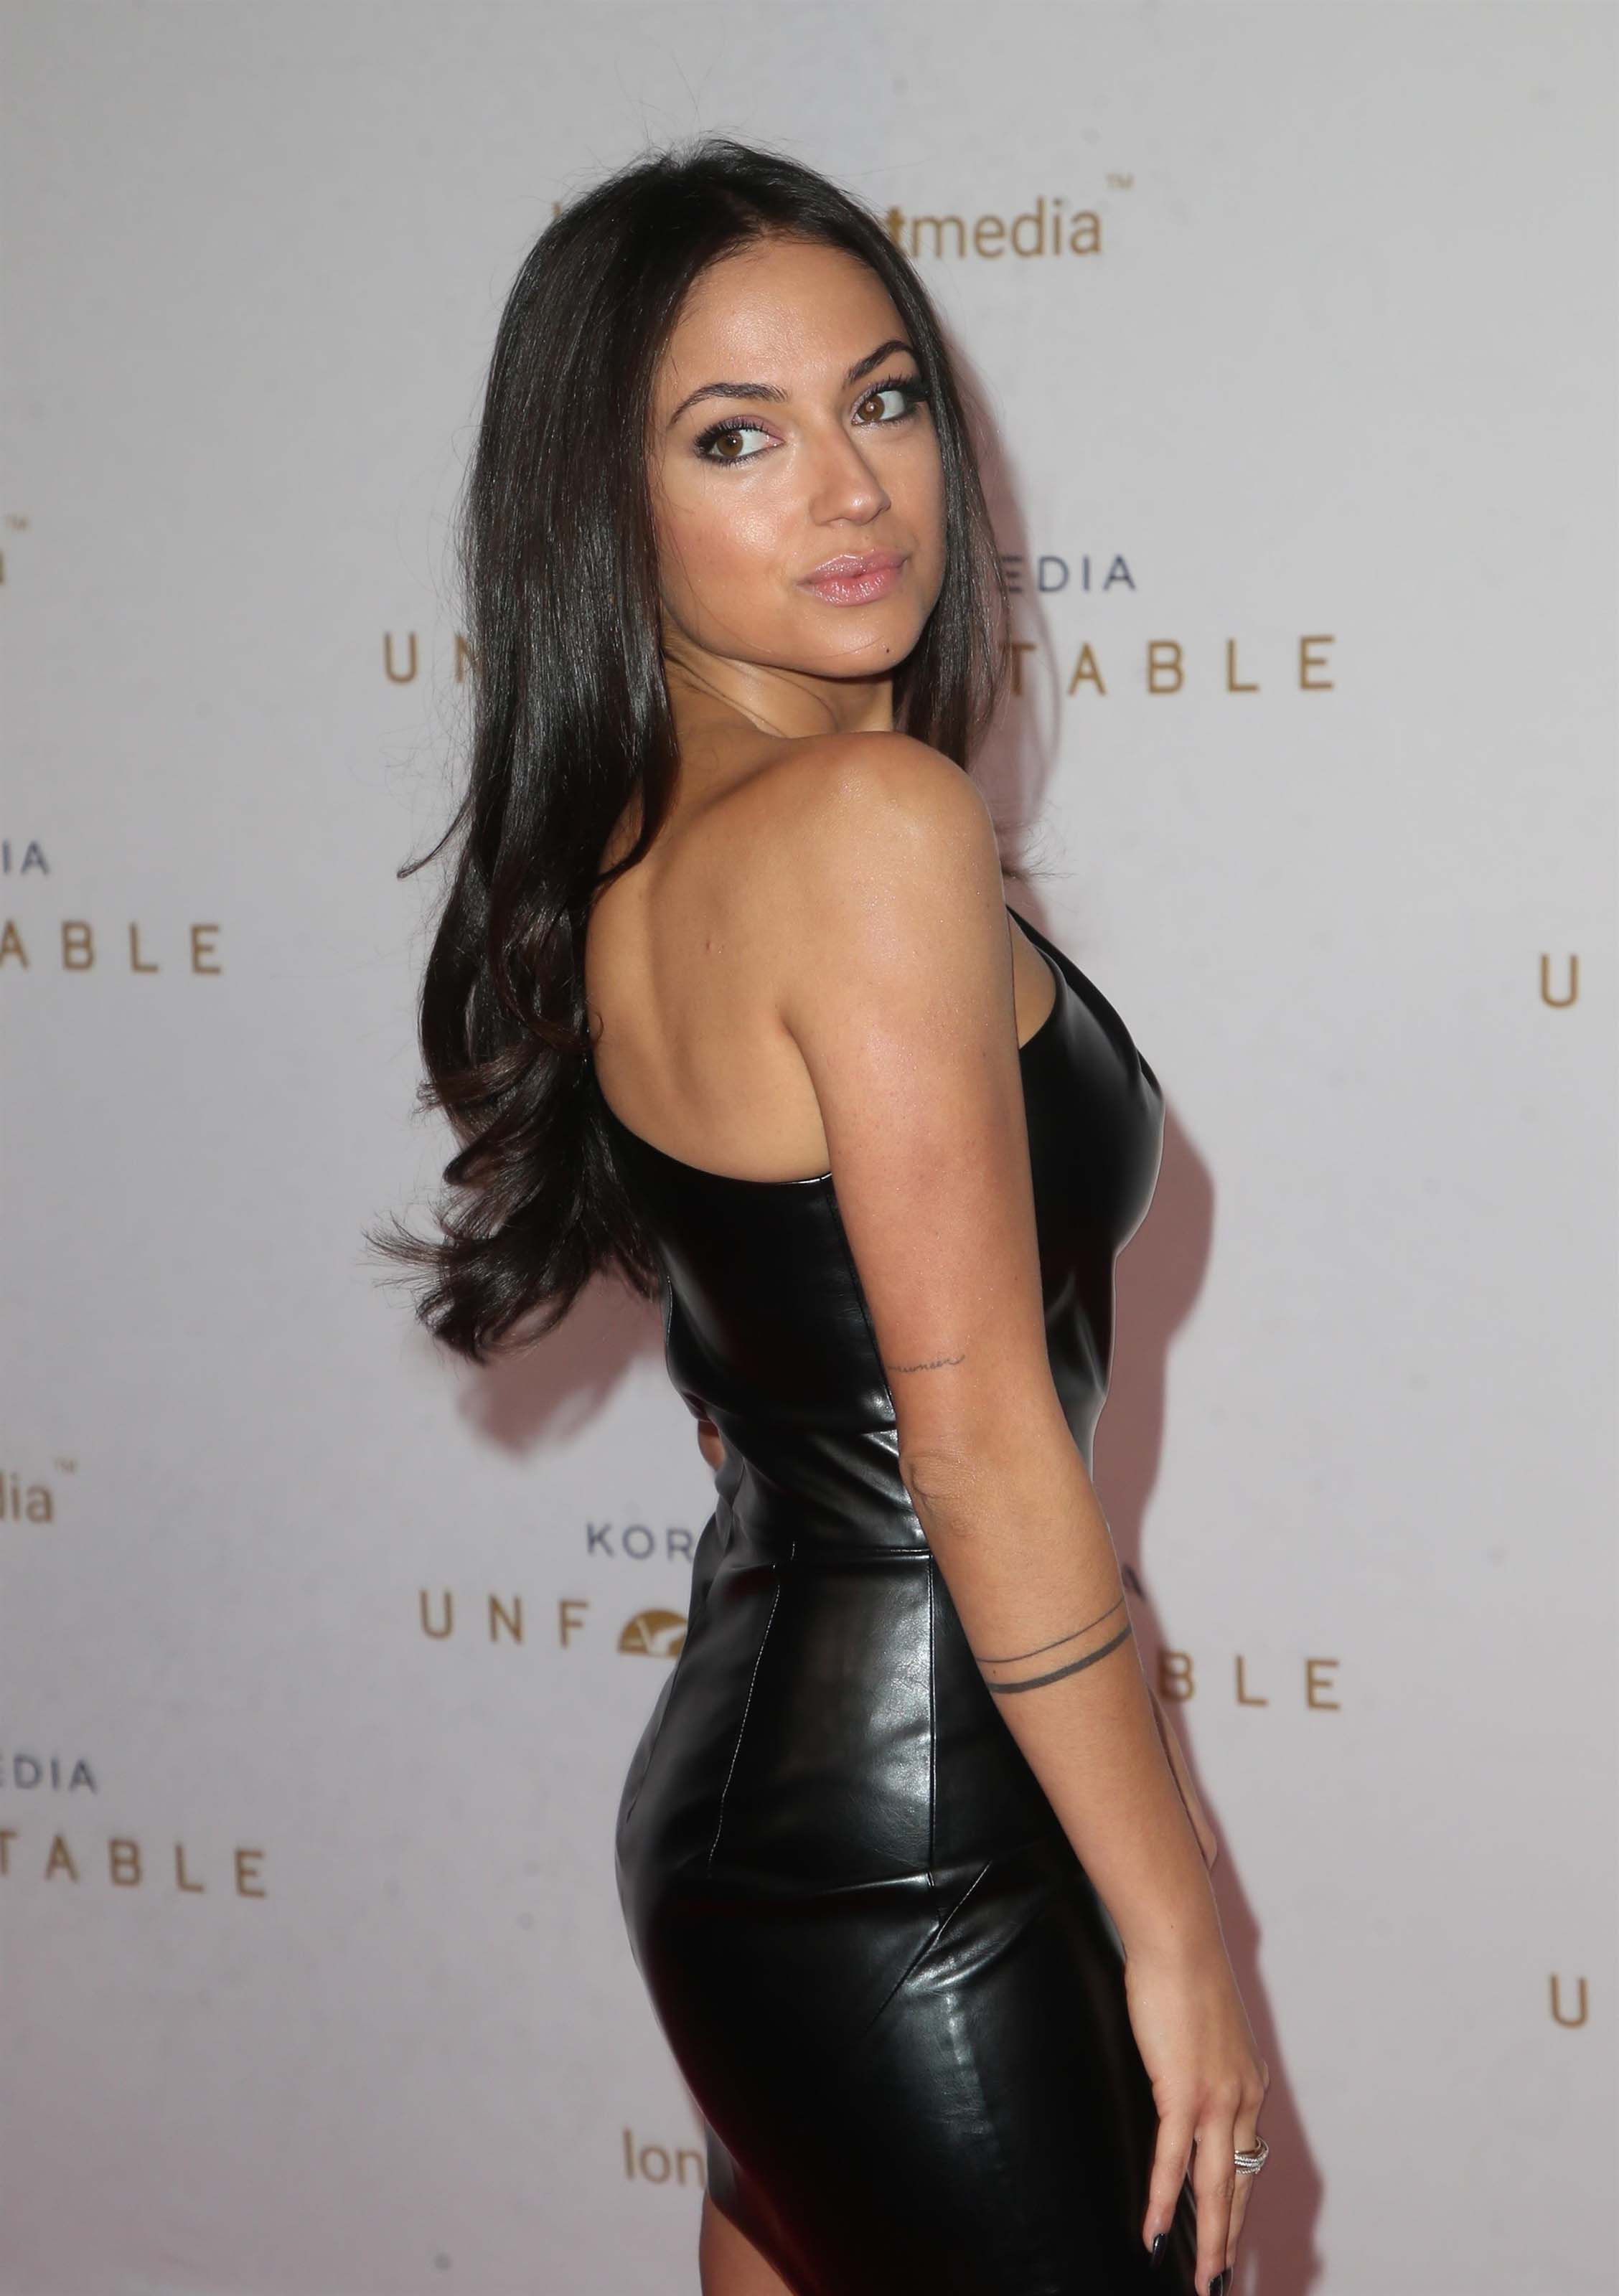 Inanna Sarkis attends Unforgettable Gala